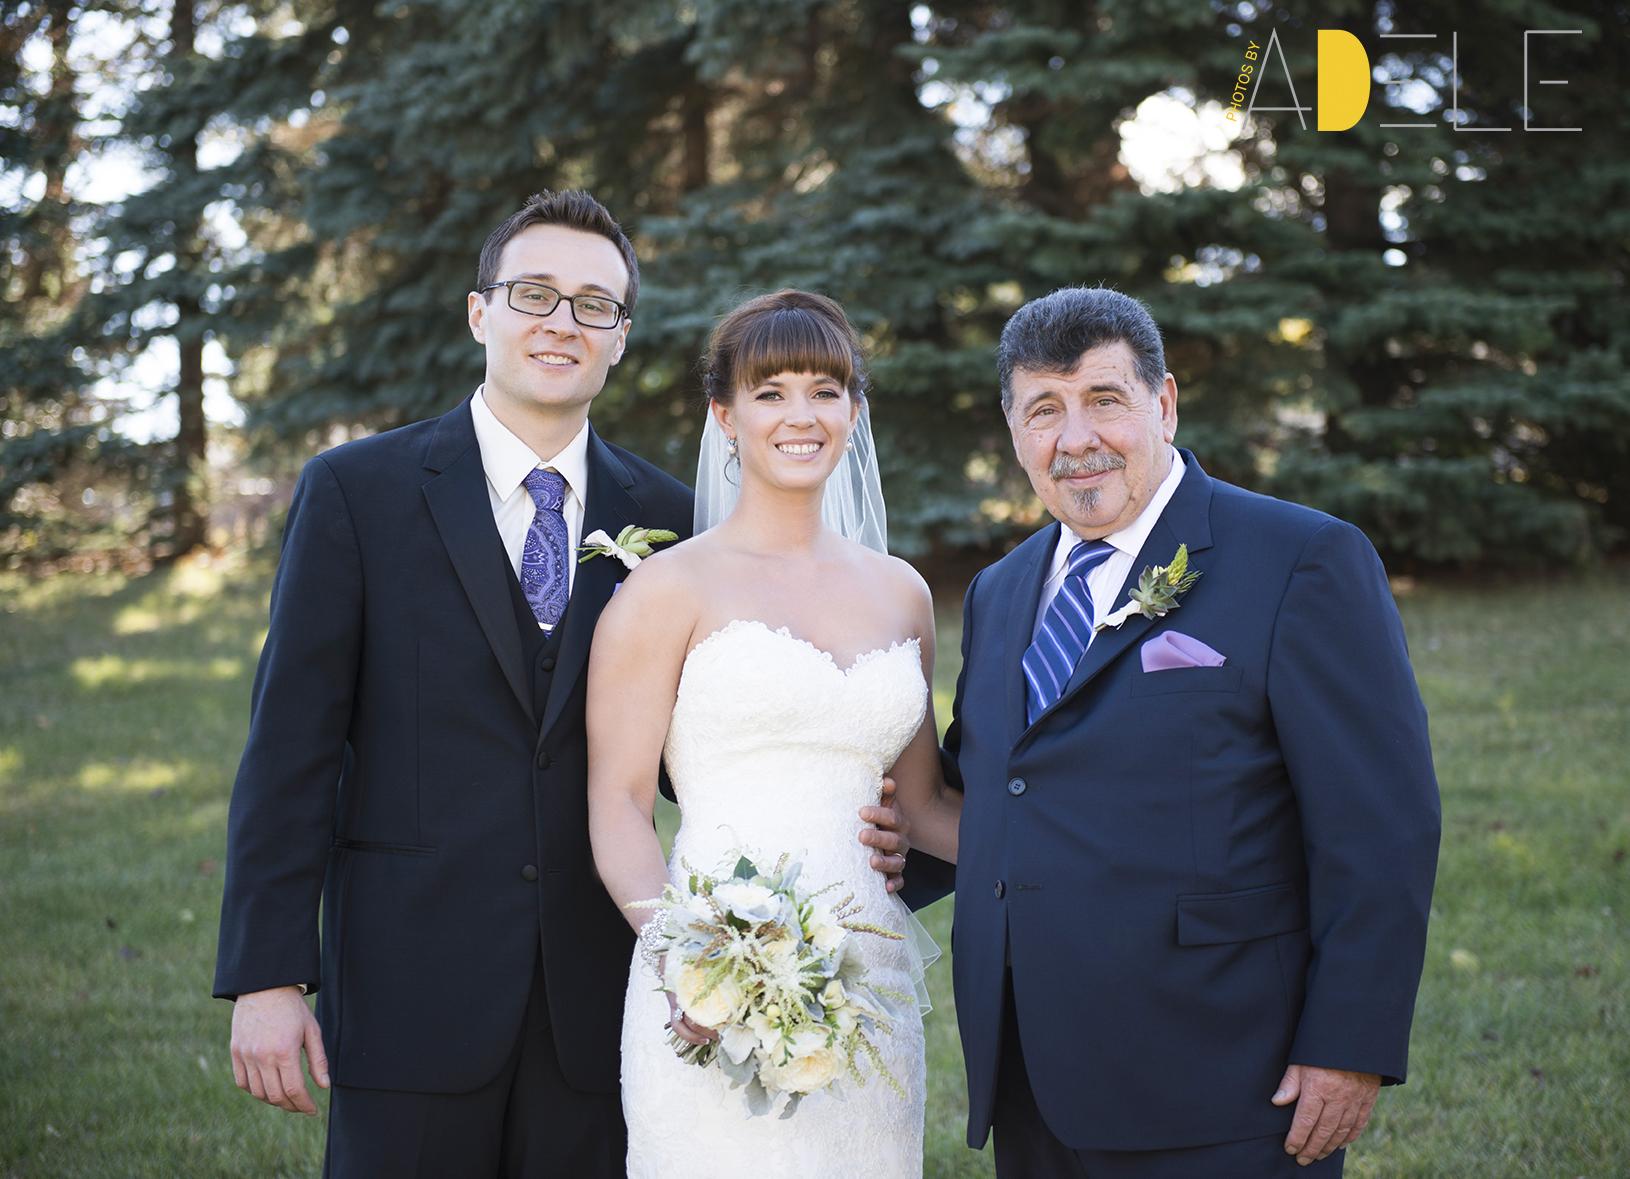 Calgary Wedding Photographer, Photos By Adele's Take On Family P